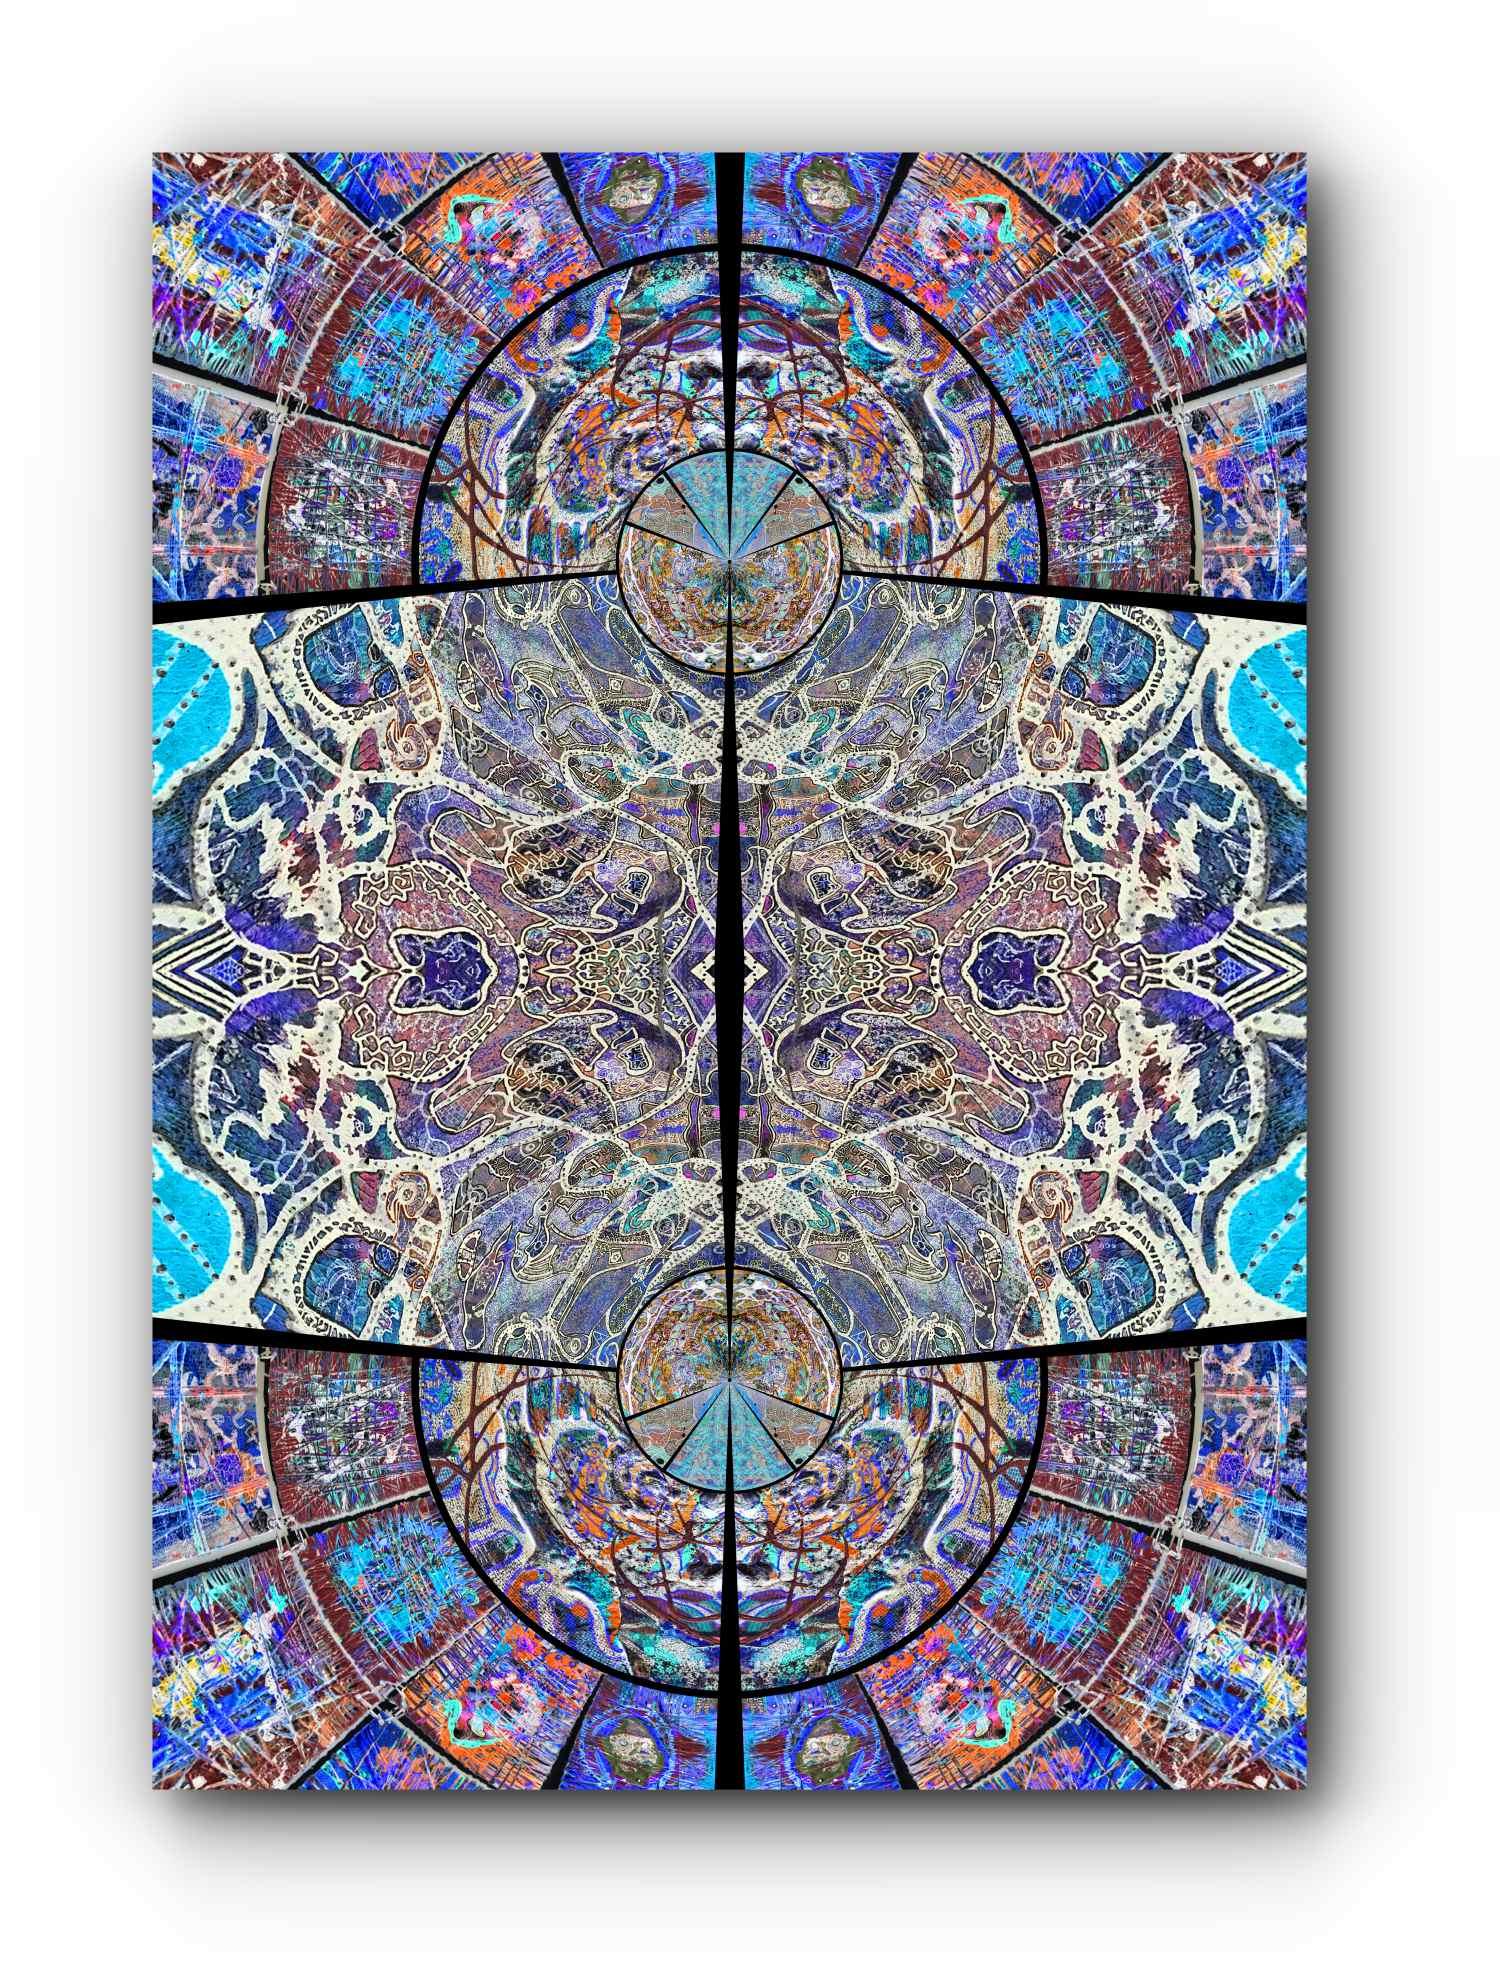 digital-art-visionary-gates-artist-duo-ingress-vortices.jpg